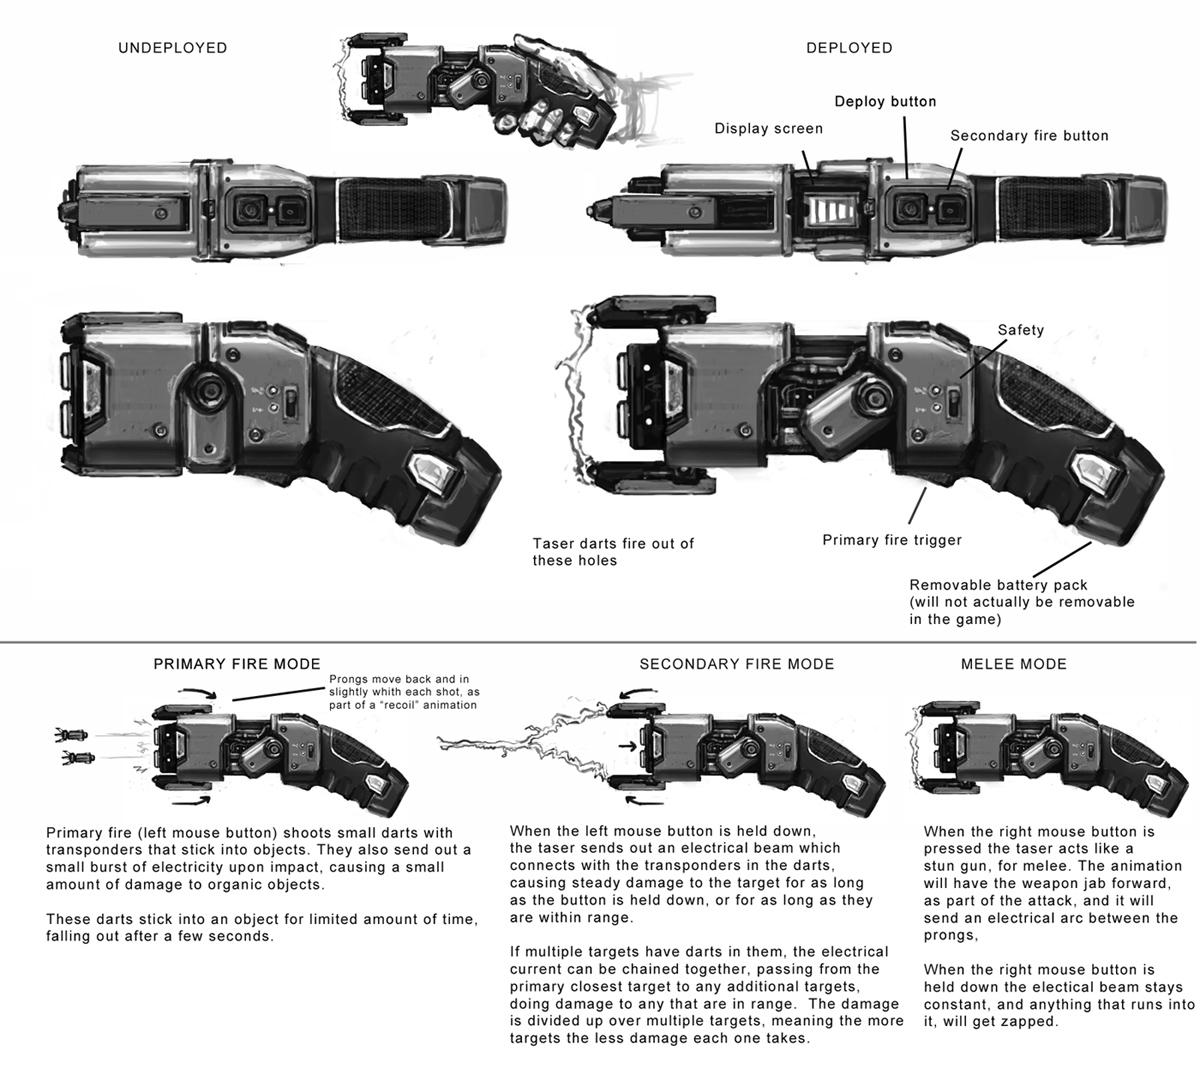 Tsa Marine Taser Concept Image